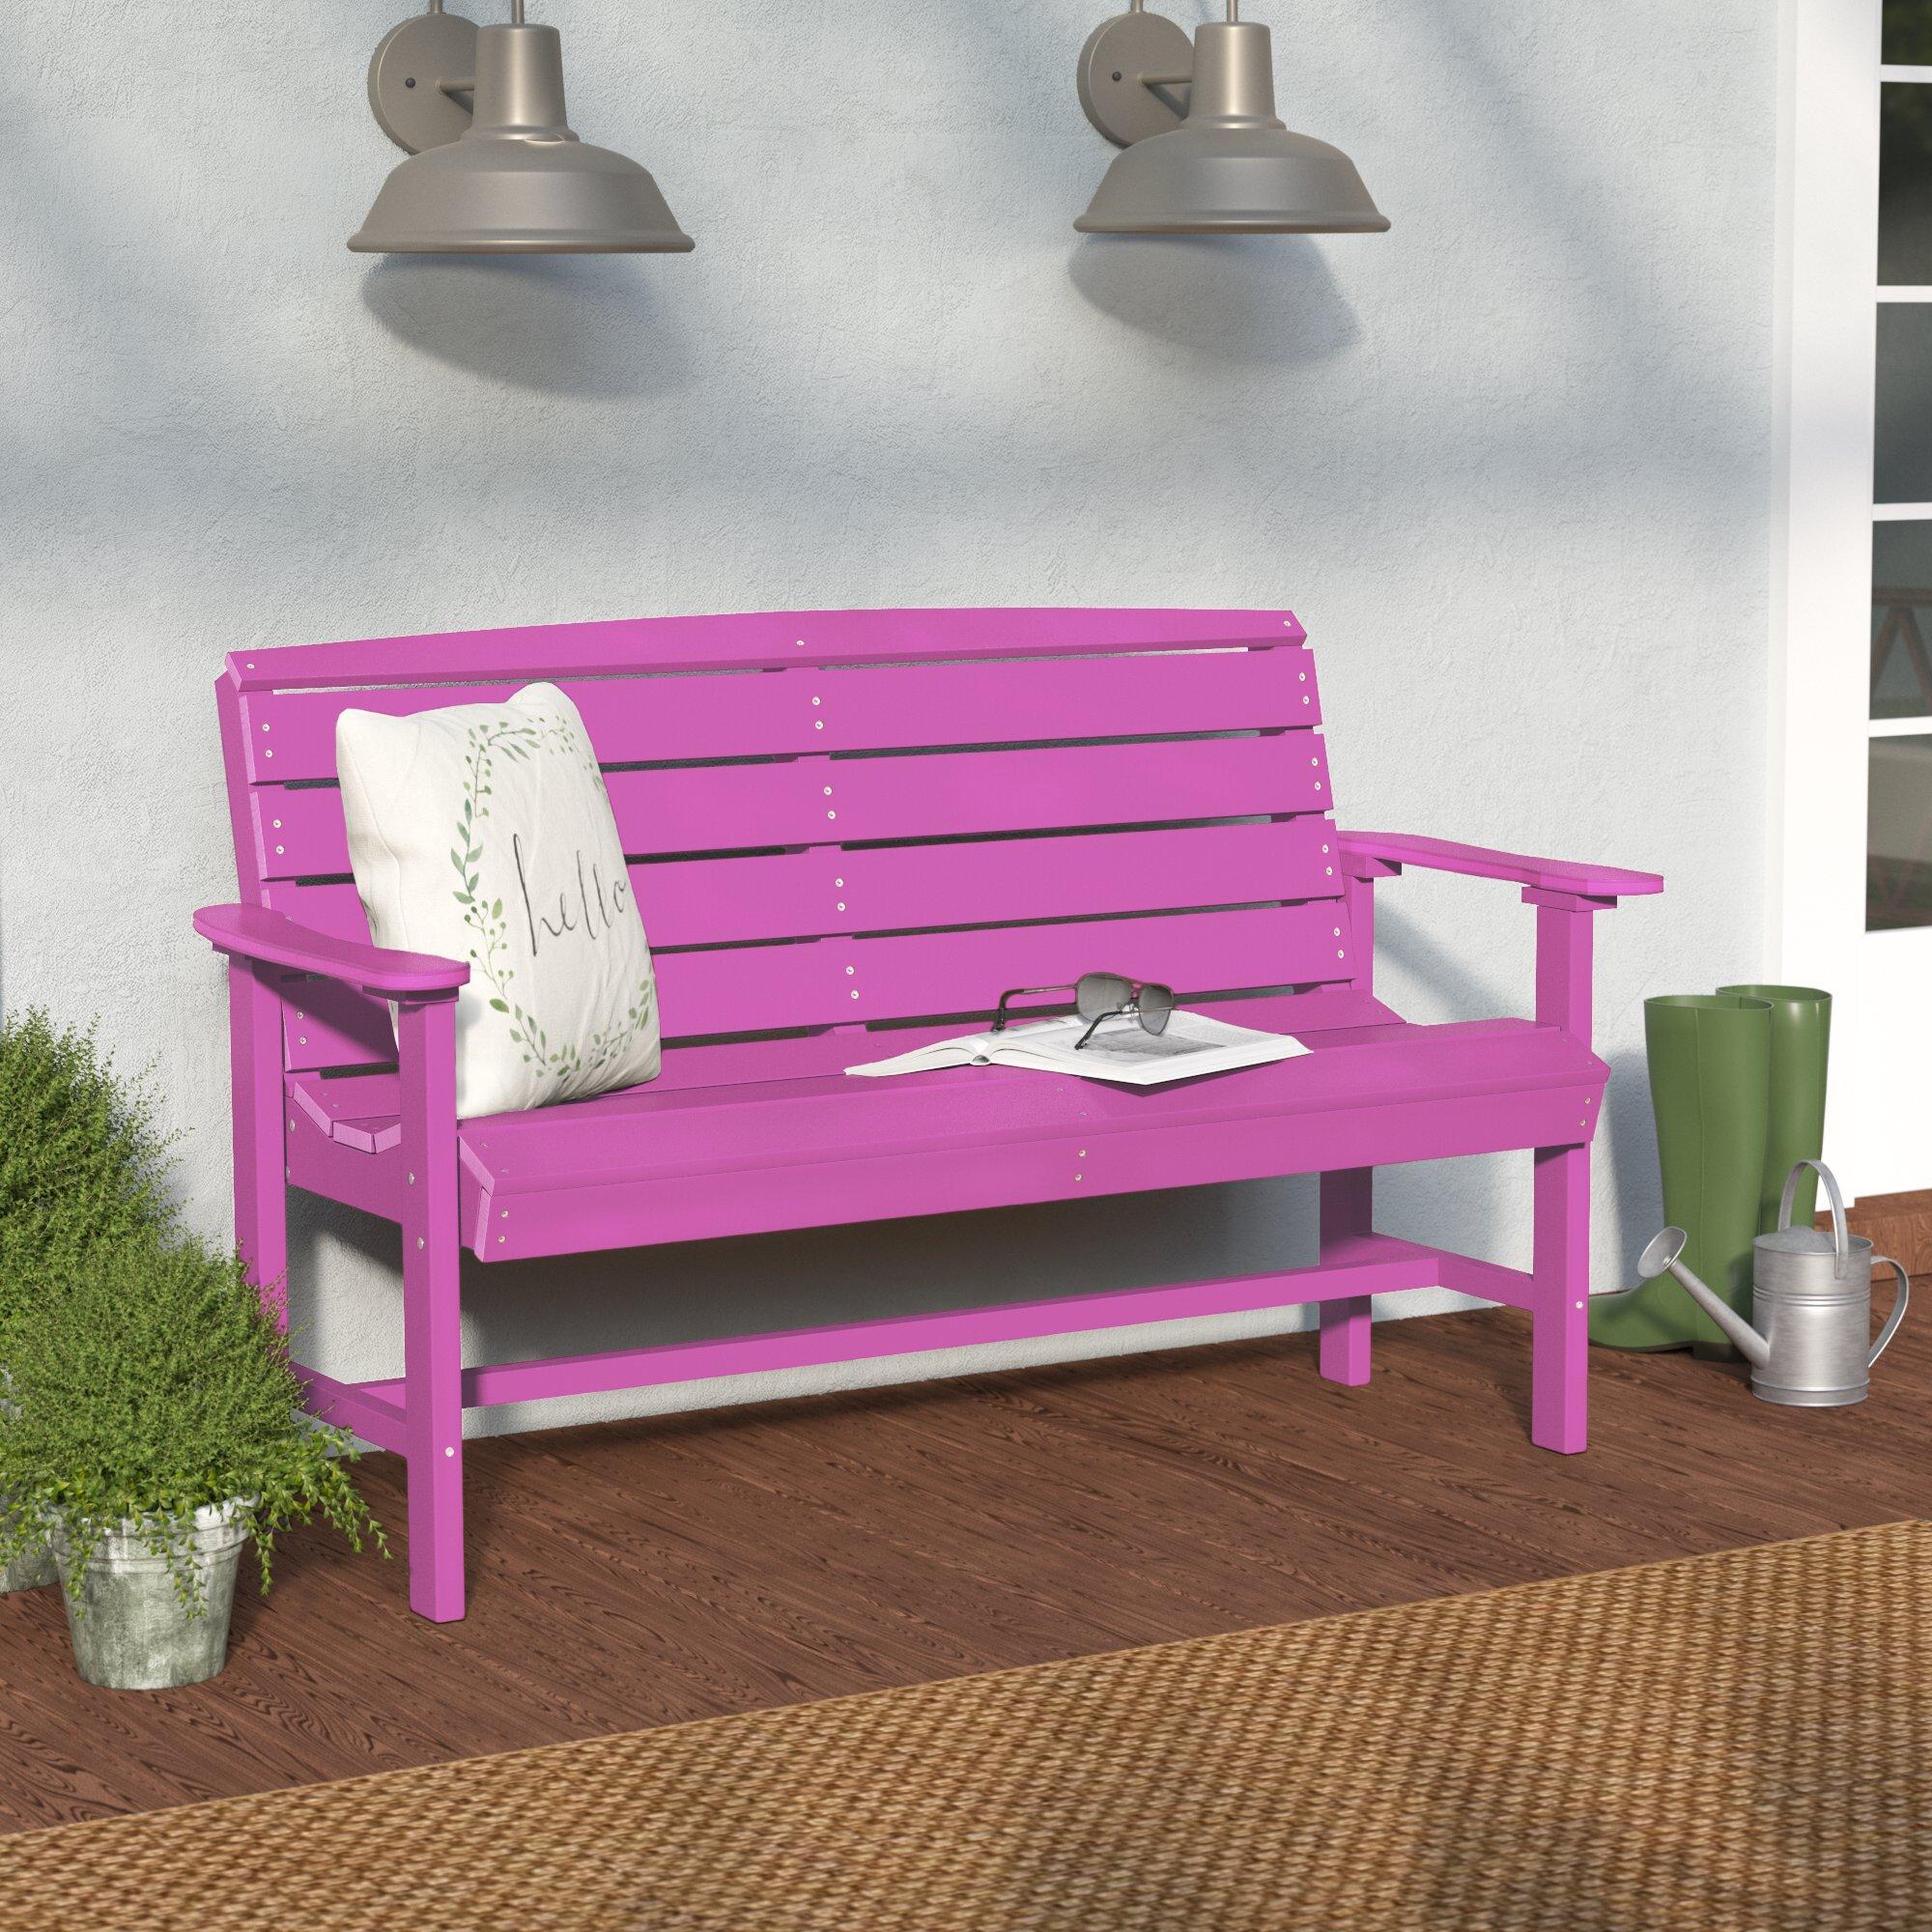 Wondrous Laurel Foundry Modern Farmhouse Sawyerville Manufactured Machost Co Dining Chair Design Ideas Machostcouk